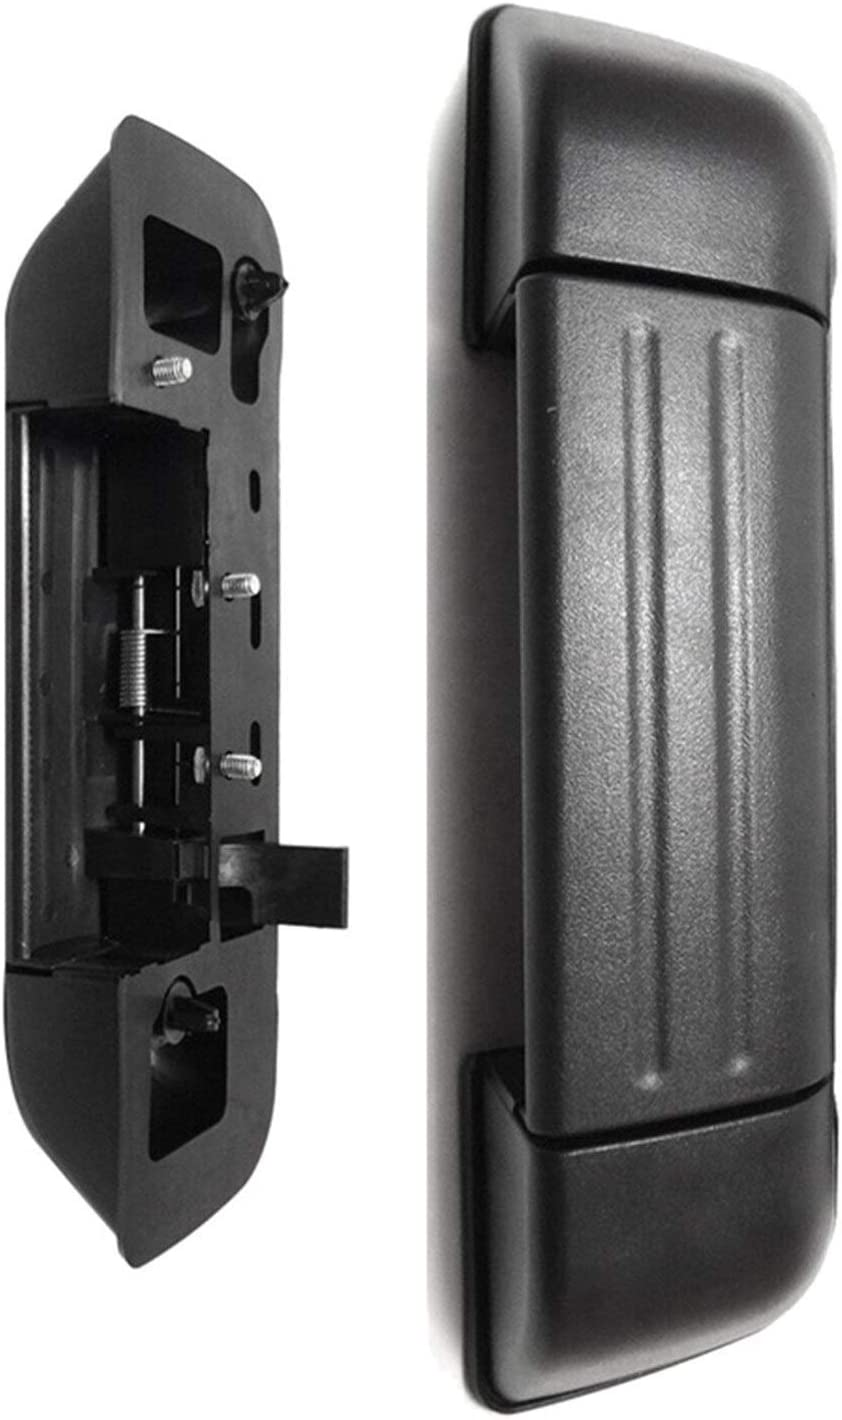 Color : Black SHOUNAO Hinten Au/ßen Au/ßen Tailgate Trunk T/ürgriff gepasst for Suzuki Vitara Grand Vitara 1998-2005 8285065D125Pk 82850-65D13